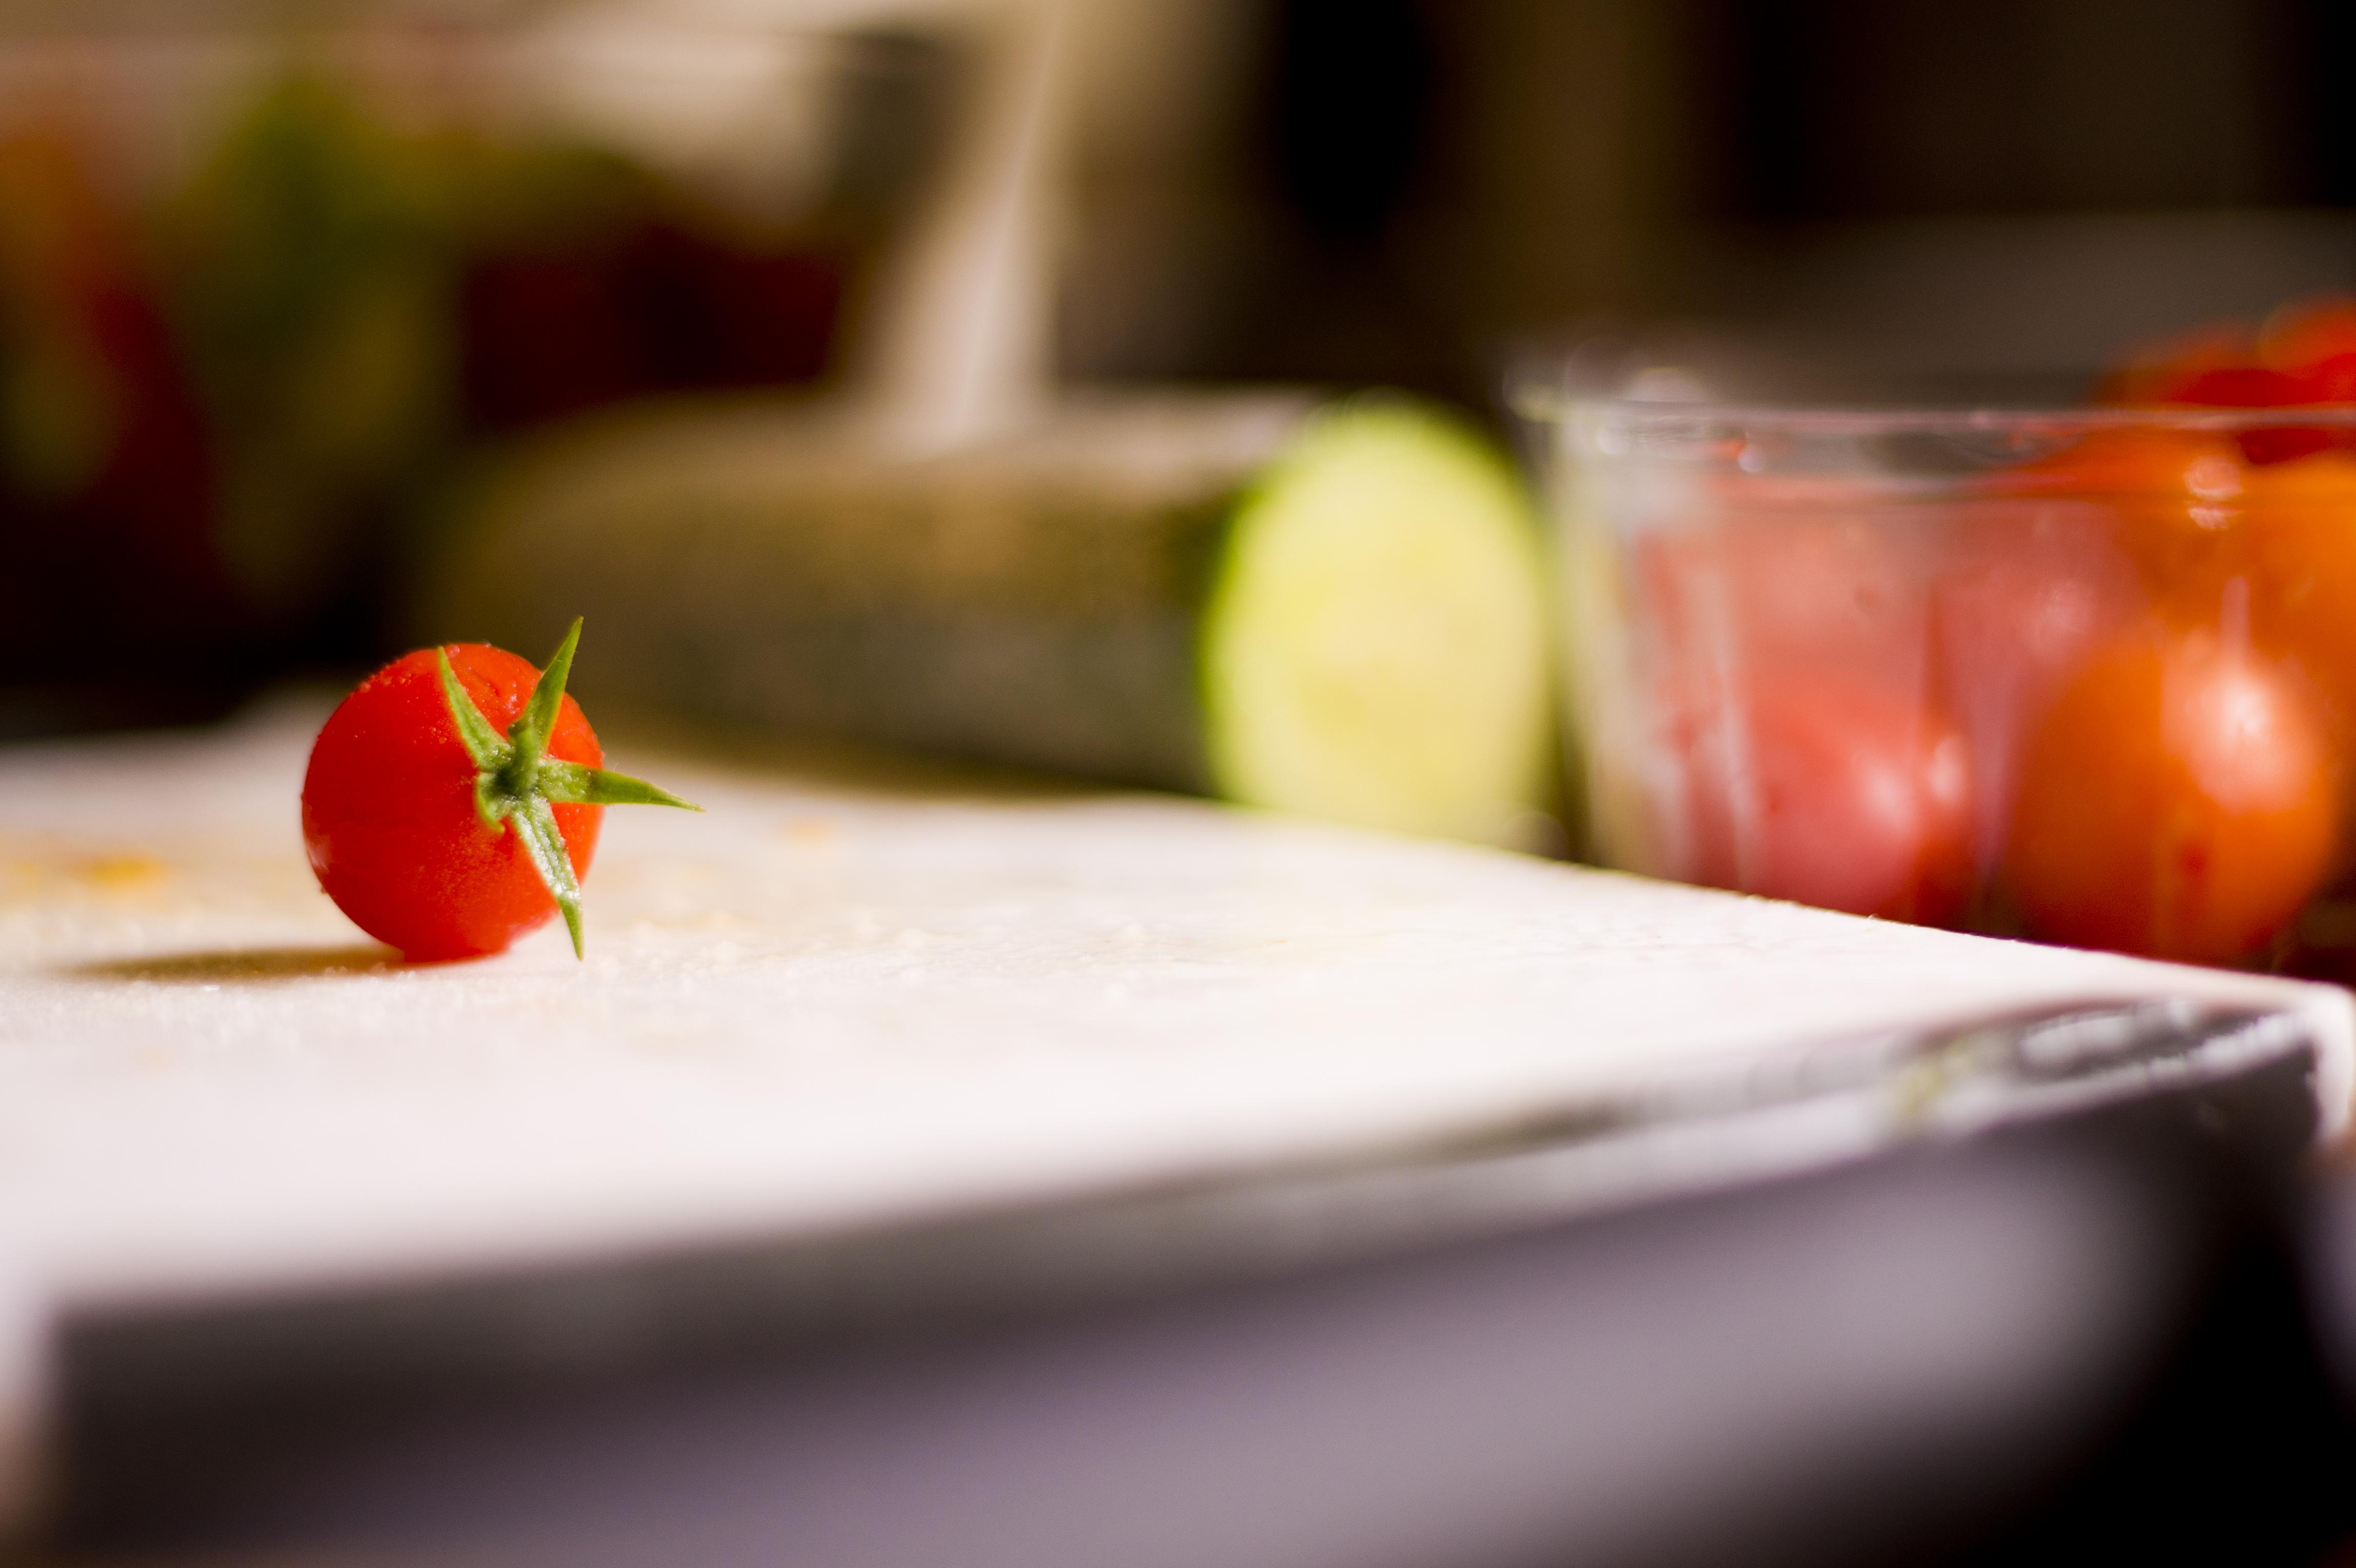 Hintergrundbilder : rot, Lebensmittel, Grün, Kochen, Küche, Blätter ...